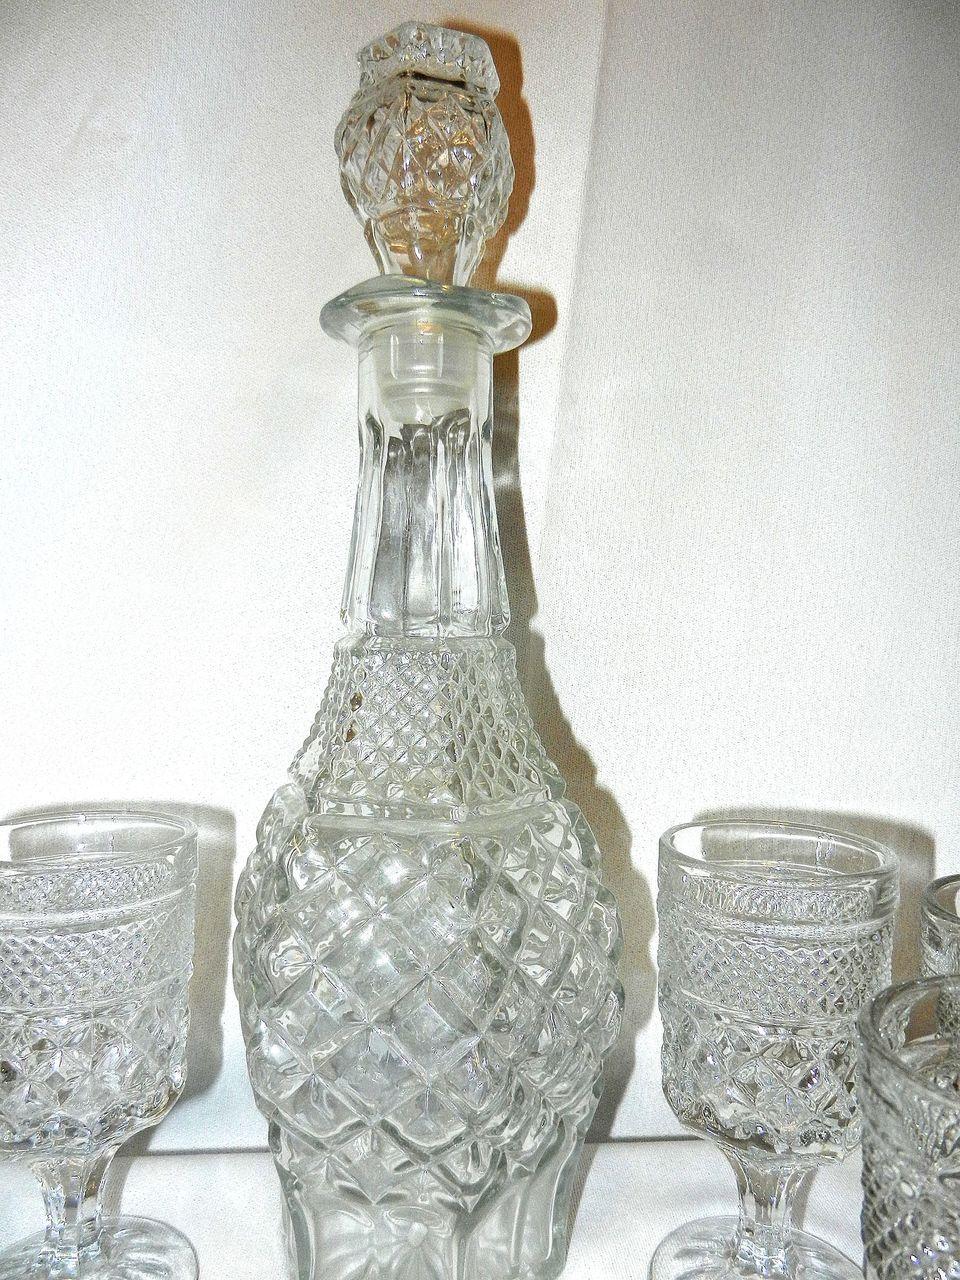 Vintage Crystal Decanter Set Cherl12345 Tamara च त र 41590676 फ न प प